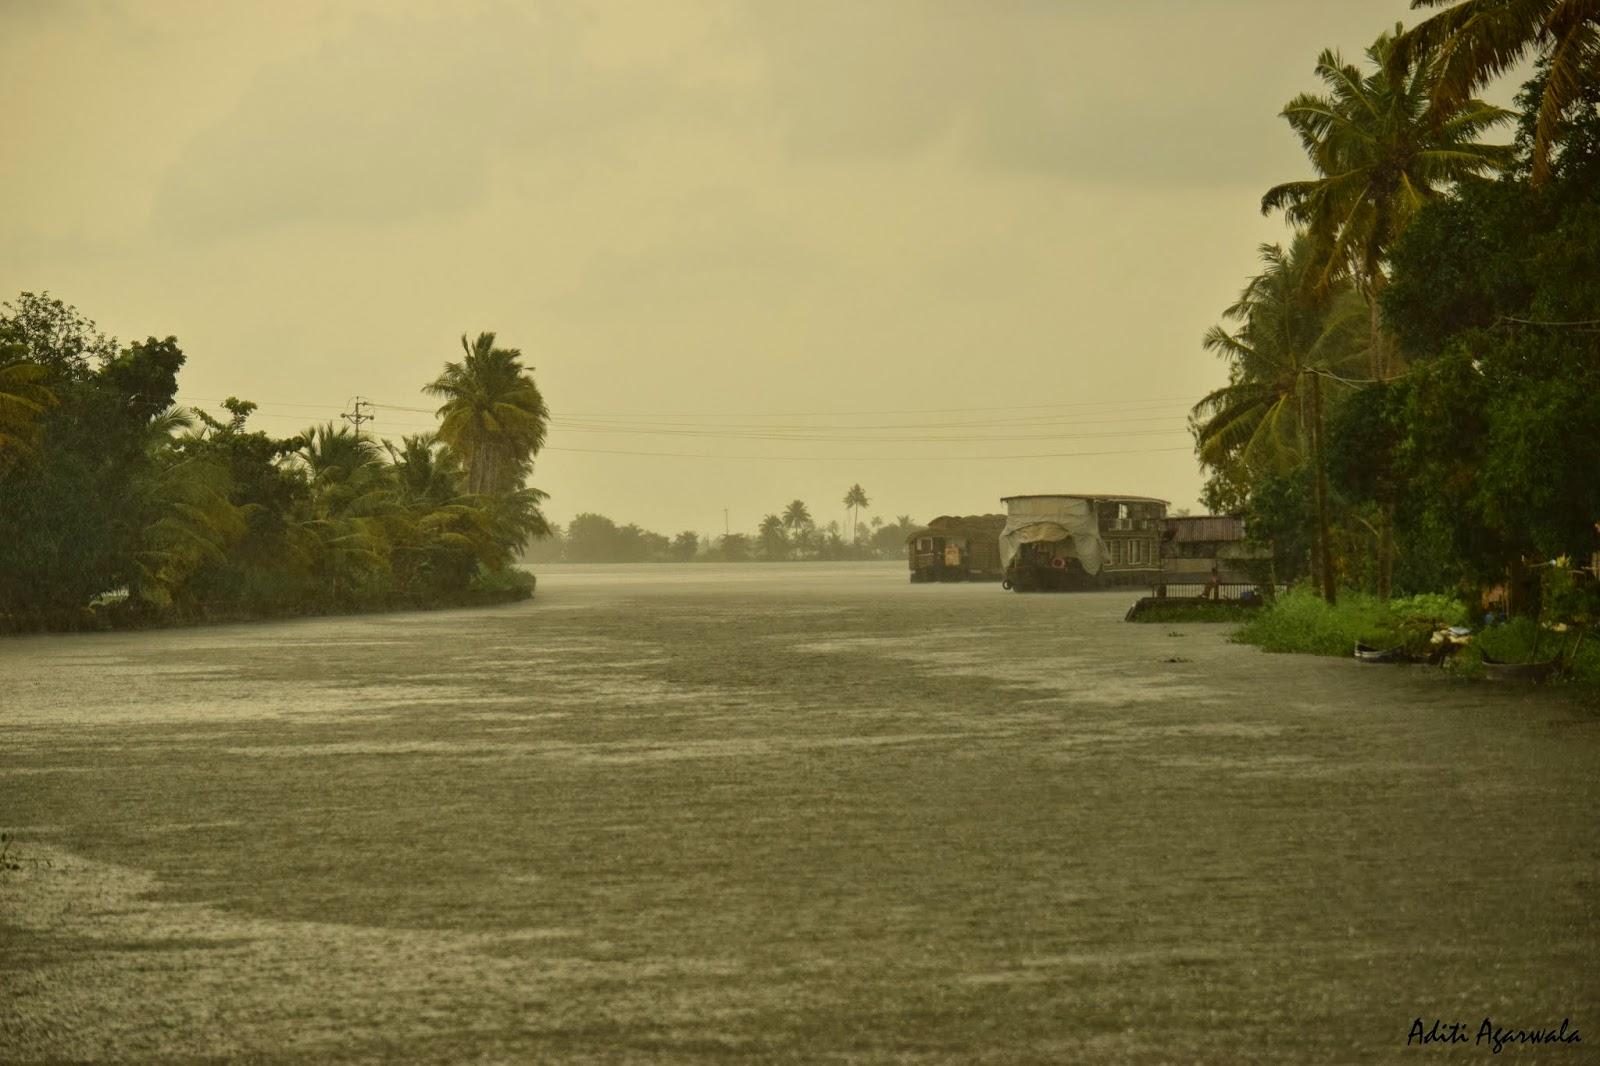 Houseboats on the backwaters of Allepey Backwaters, Kerala